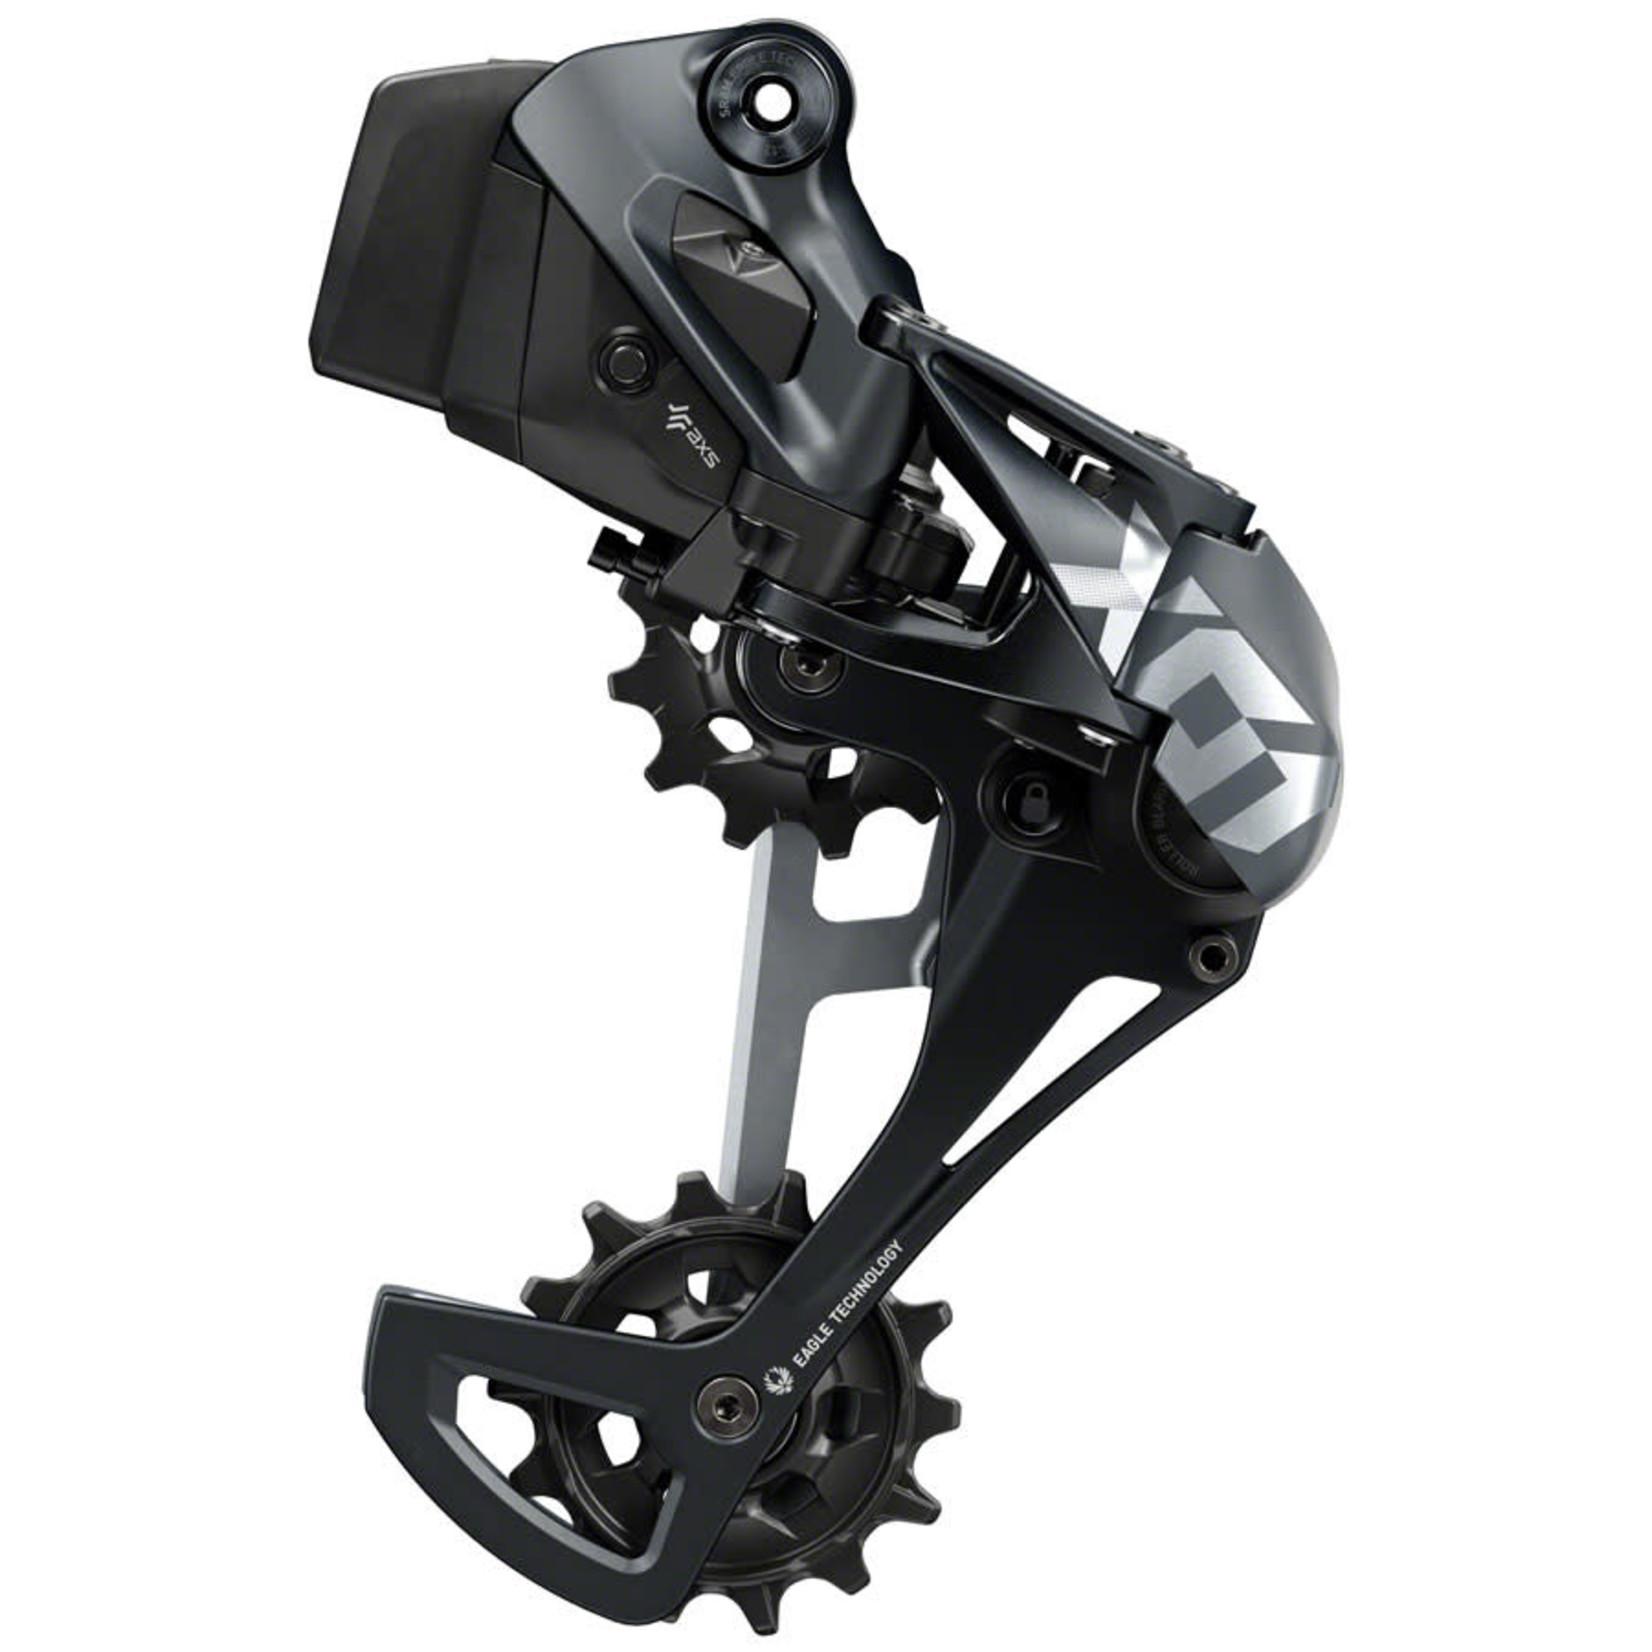 SRAM SRAM X01 Eagle AXS Rear Derailleur